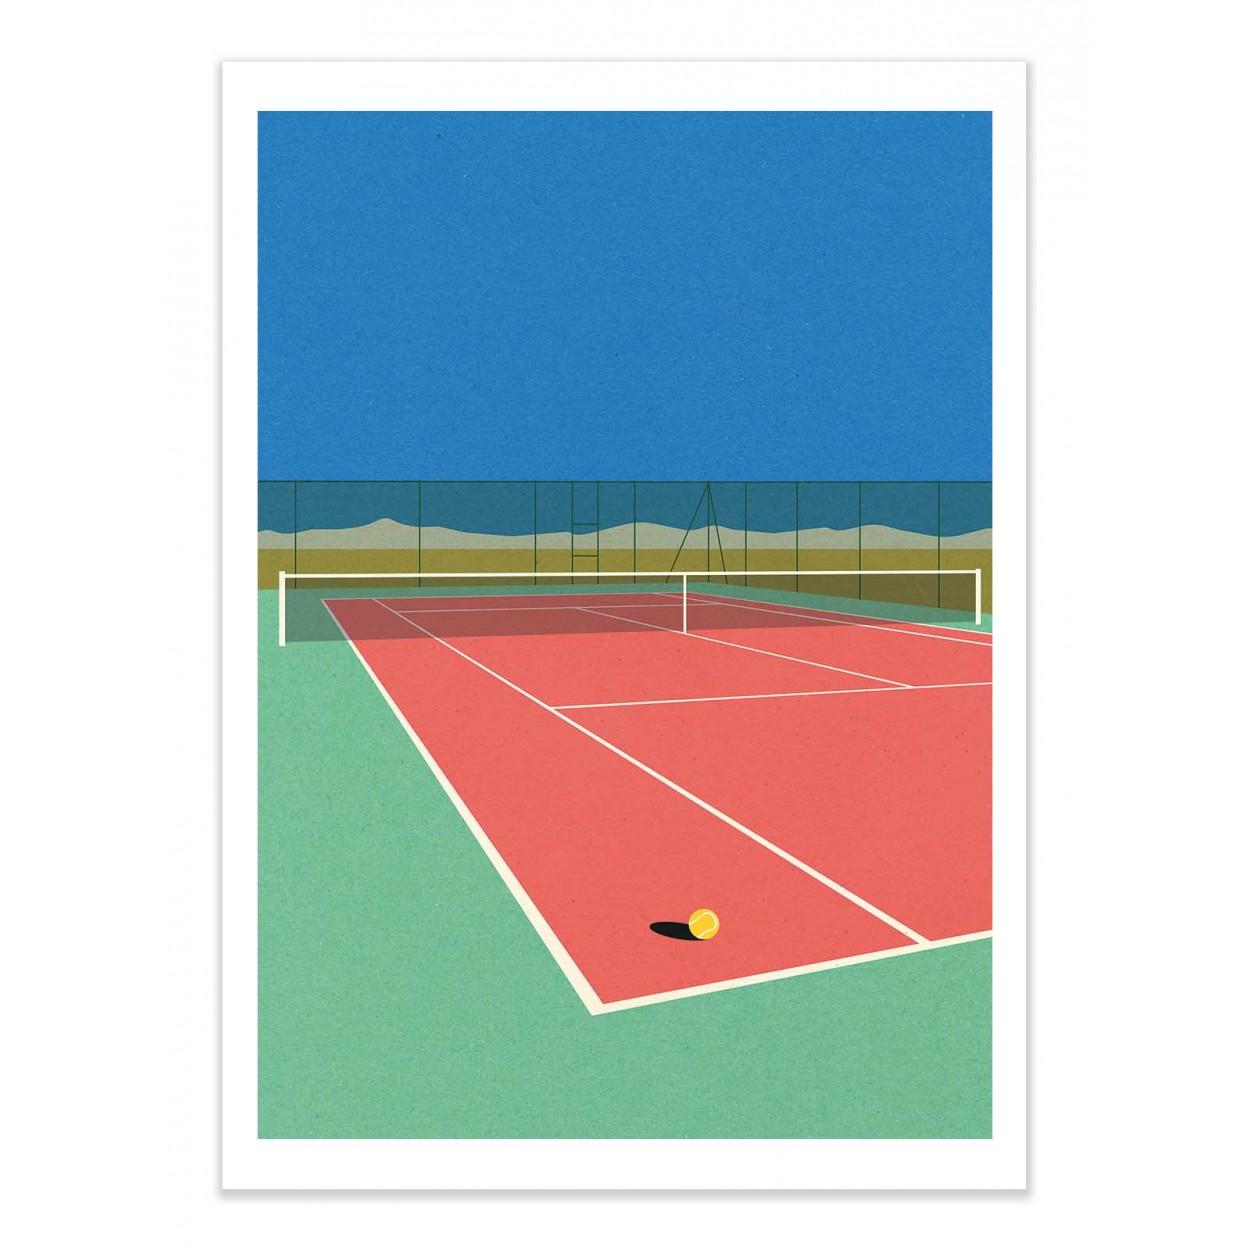 TENNIS COURT IN THE DESERT - Affiche d'art 50 x 70 cm